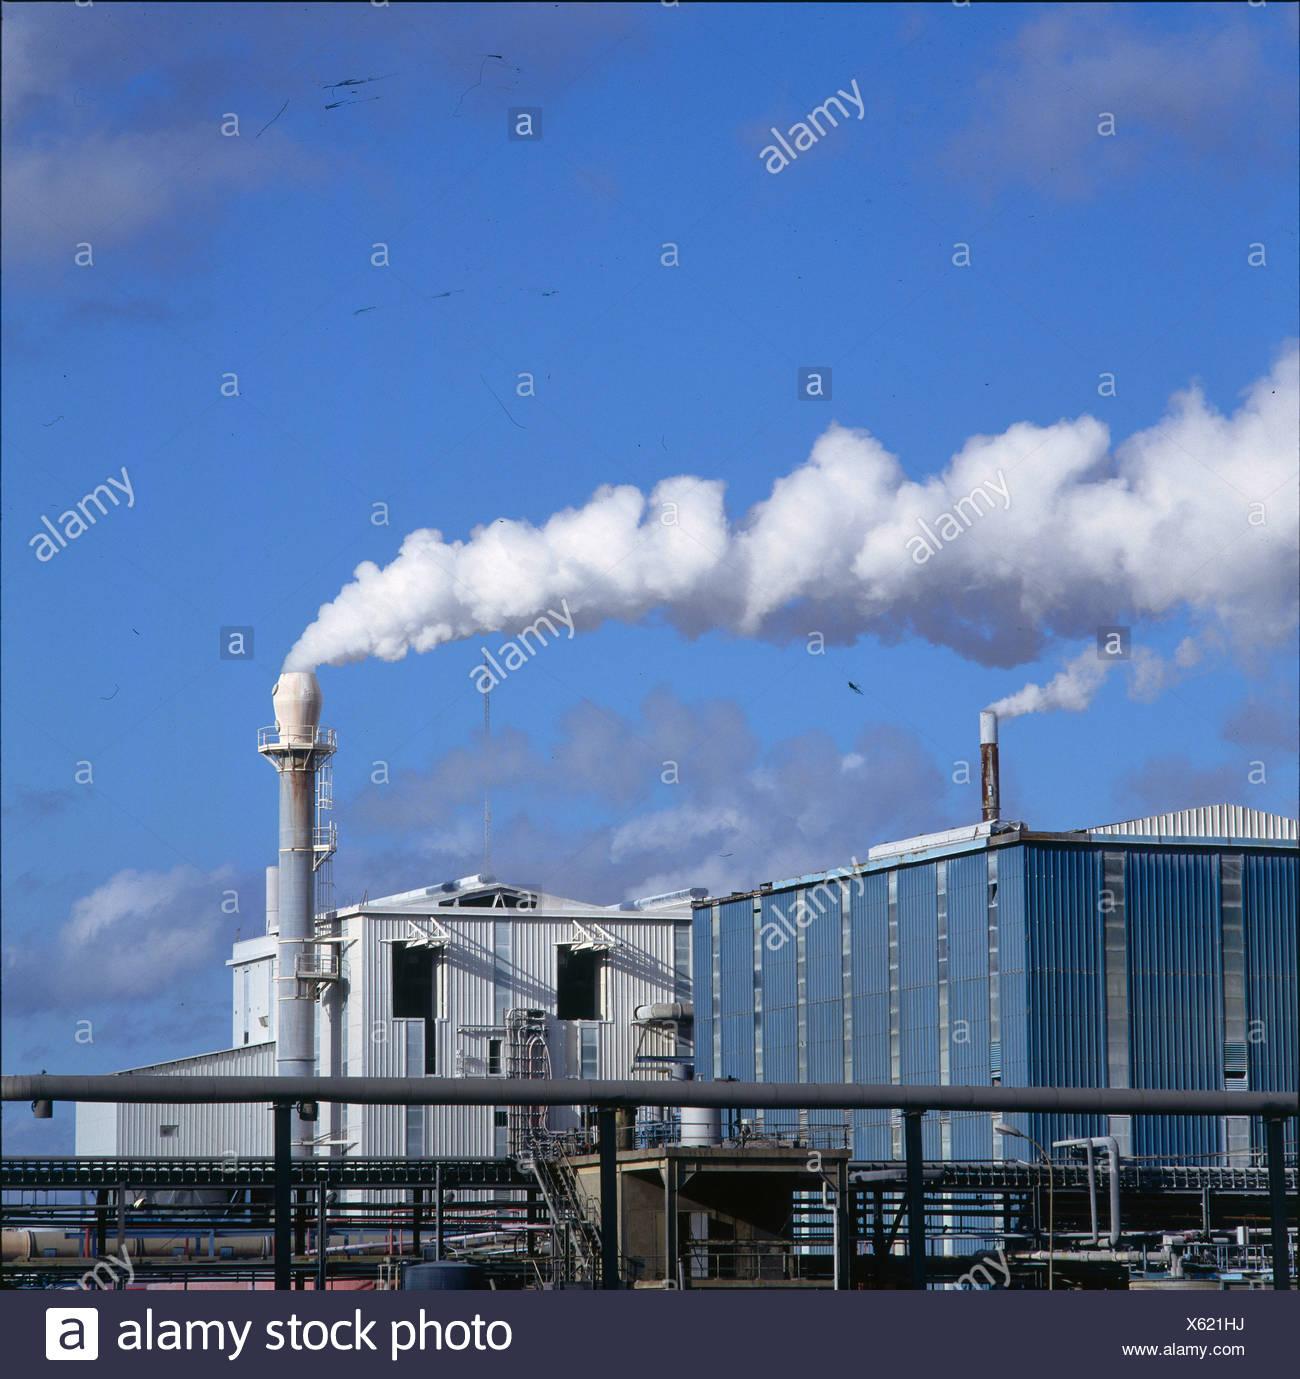 Smoke emitting from smokestacks, Calais, France Stock Photo